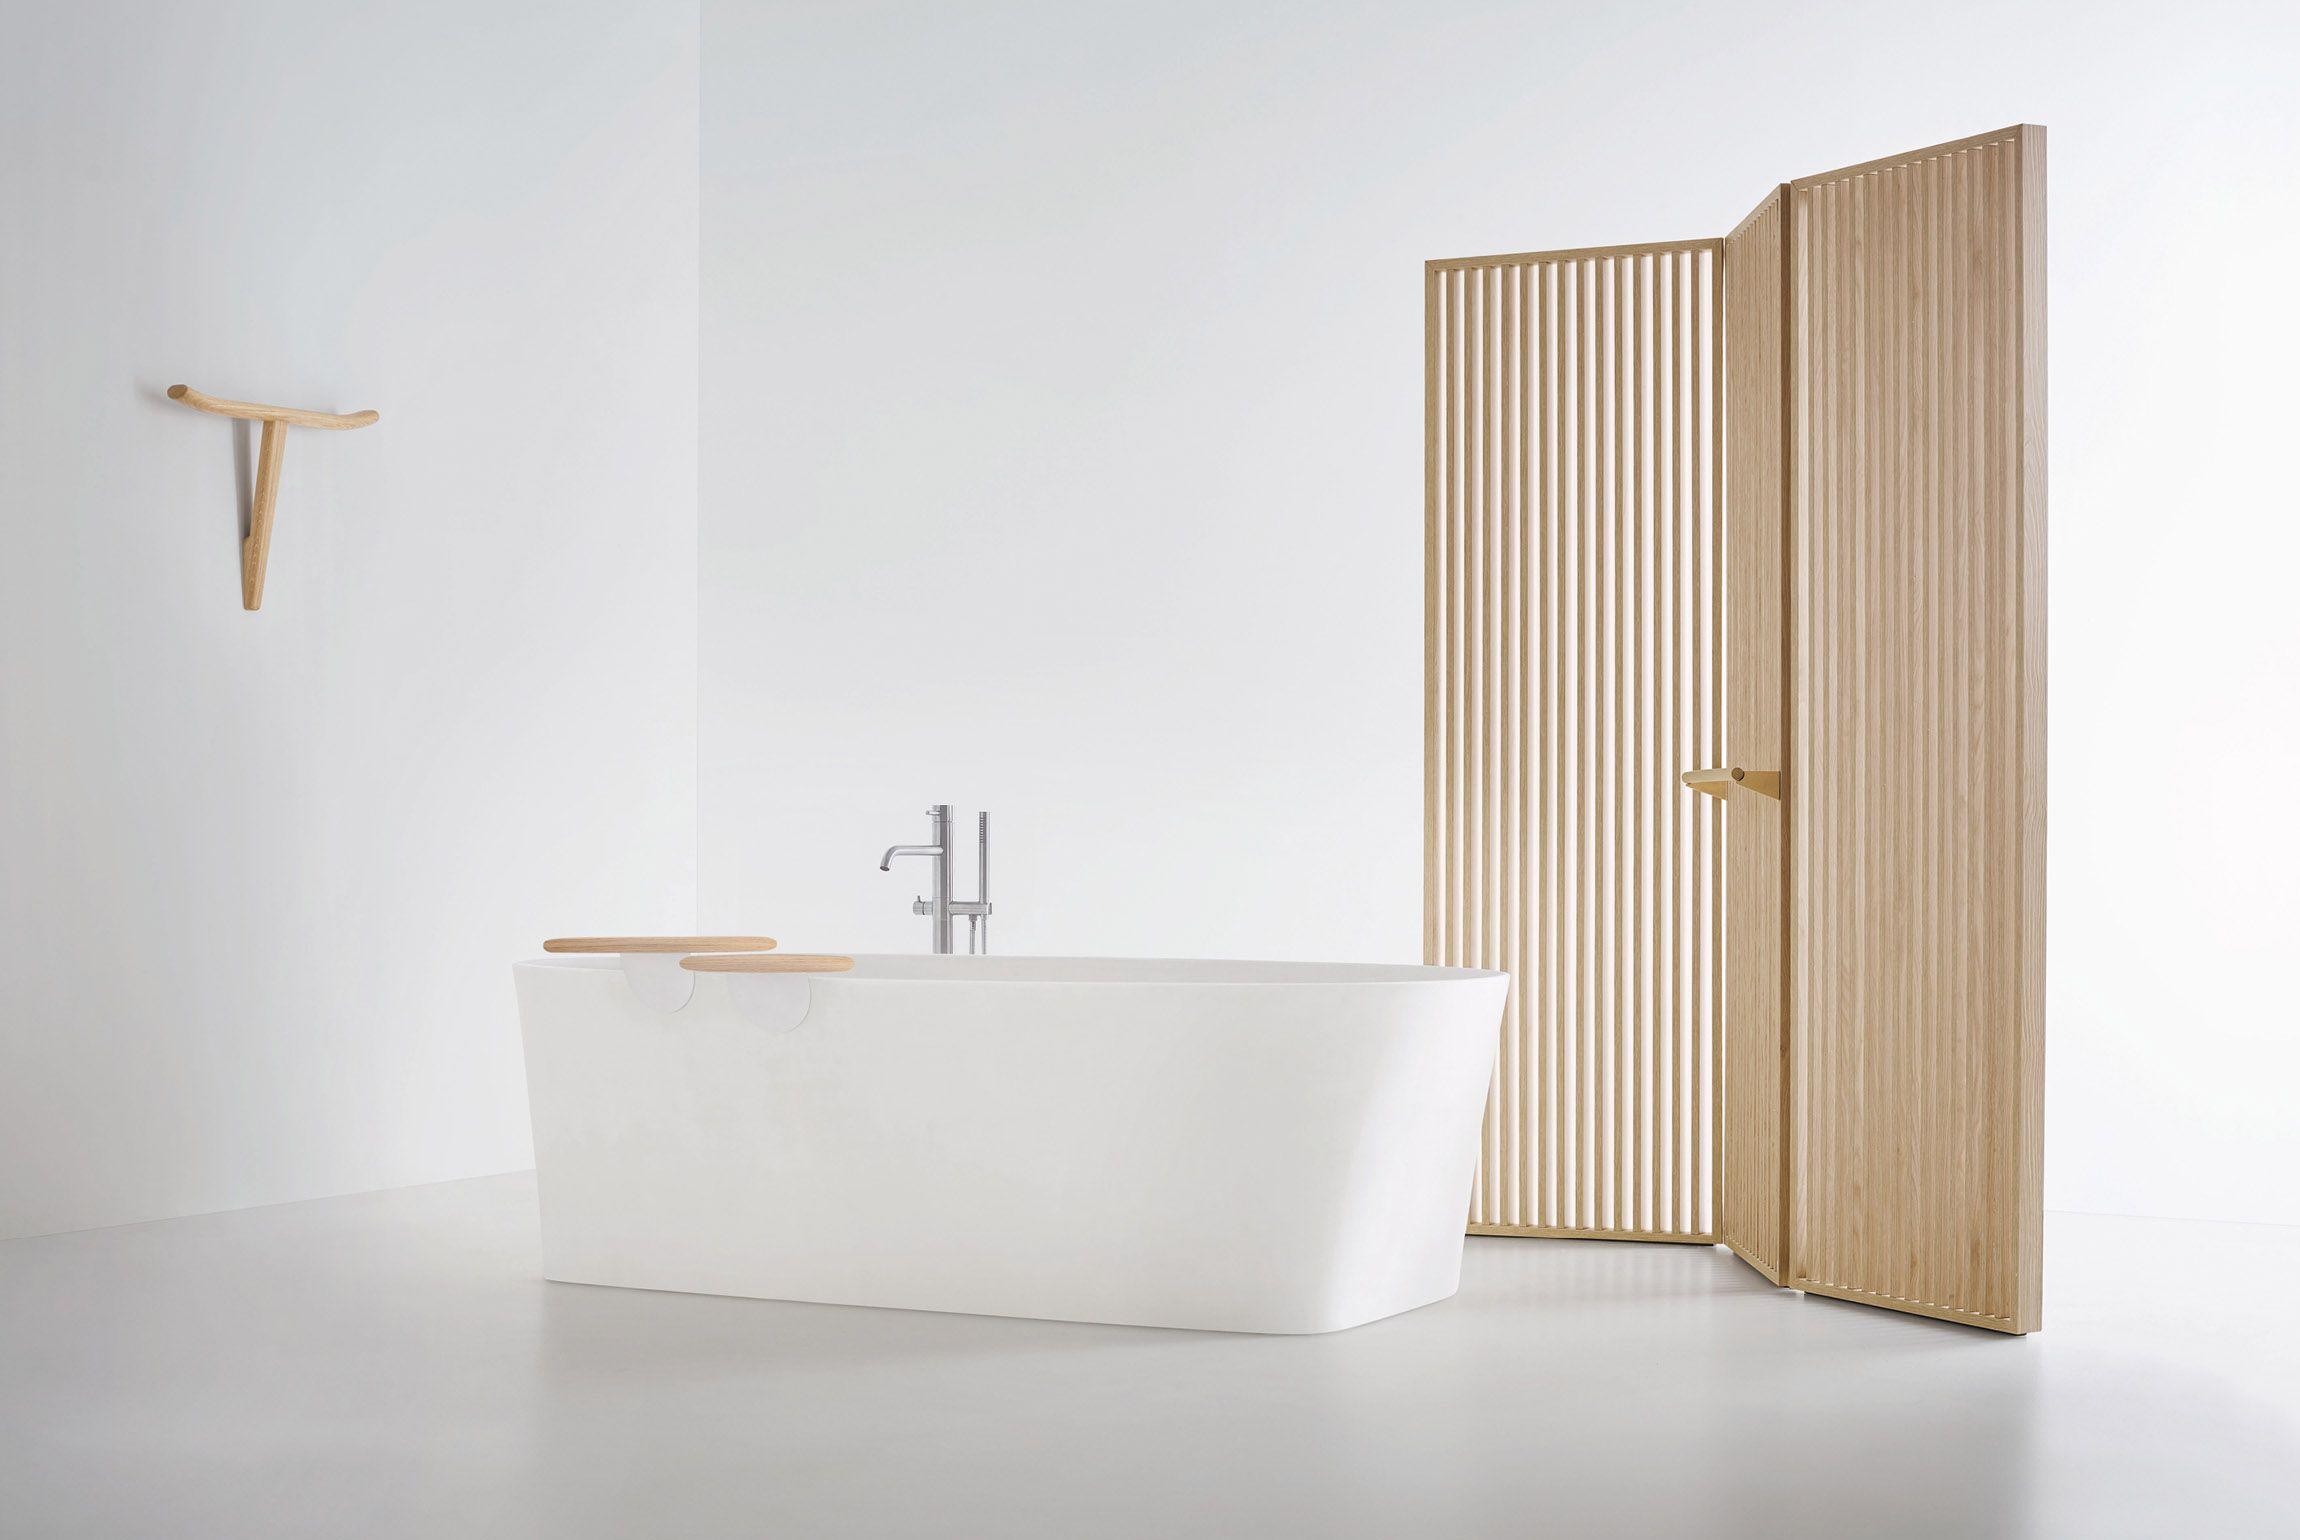 Azuma collection - design Lievore Altherr | Noorth | Bathroom ...